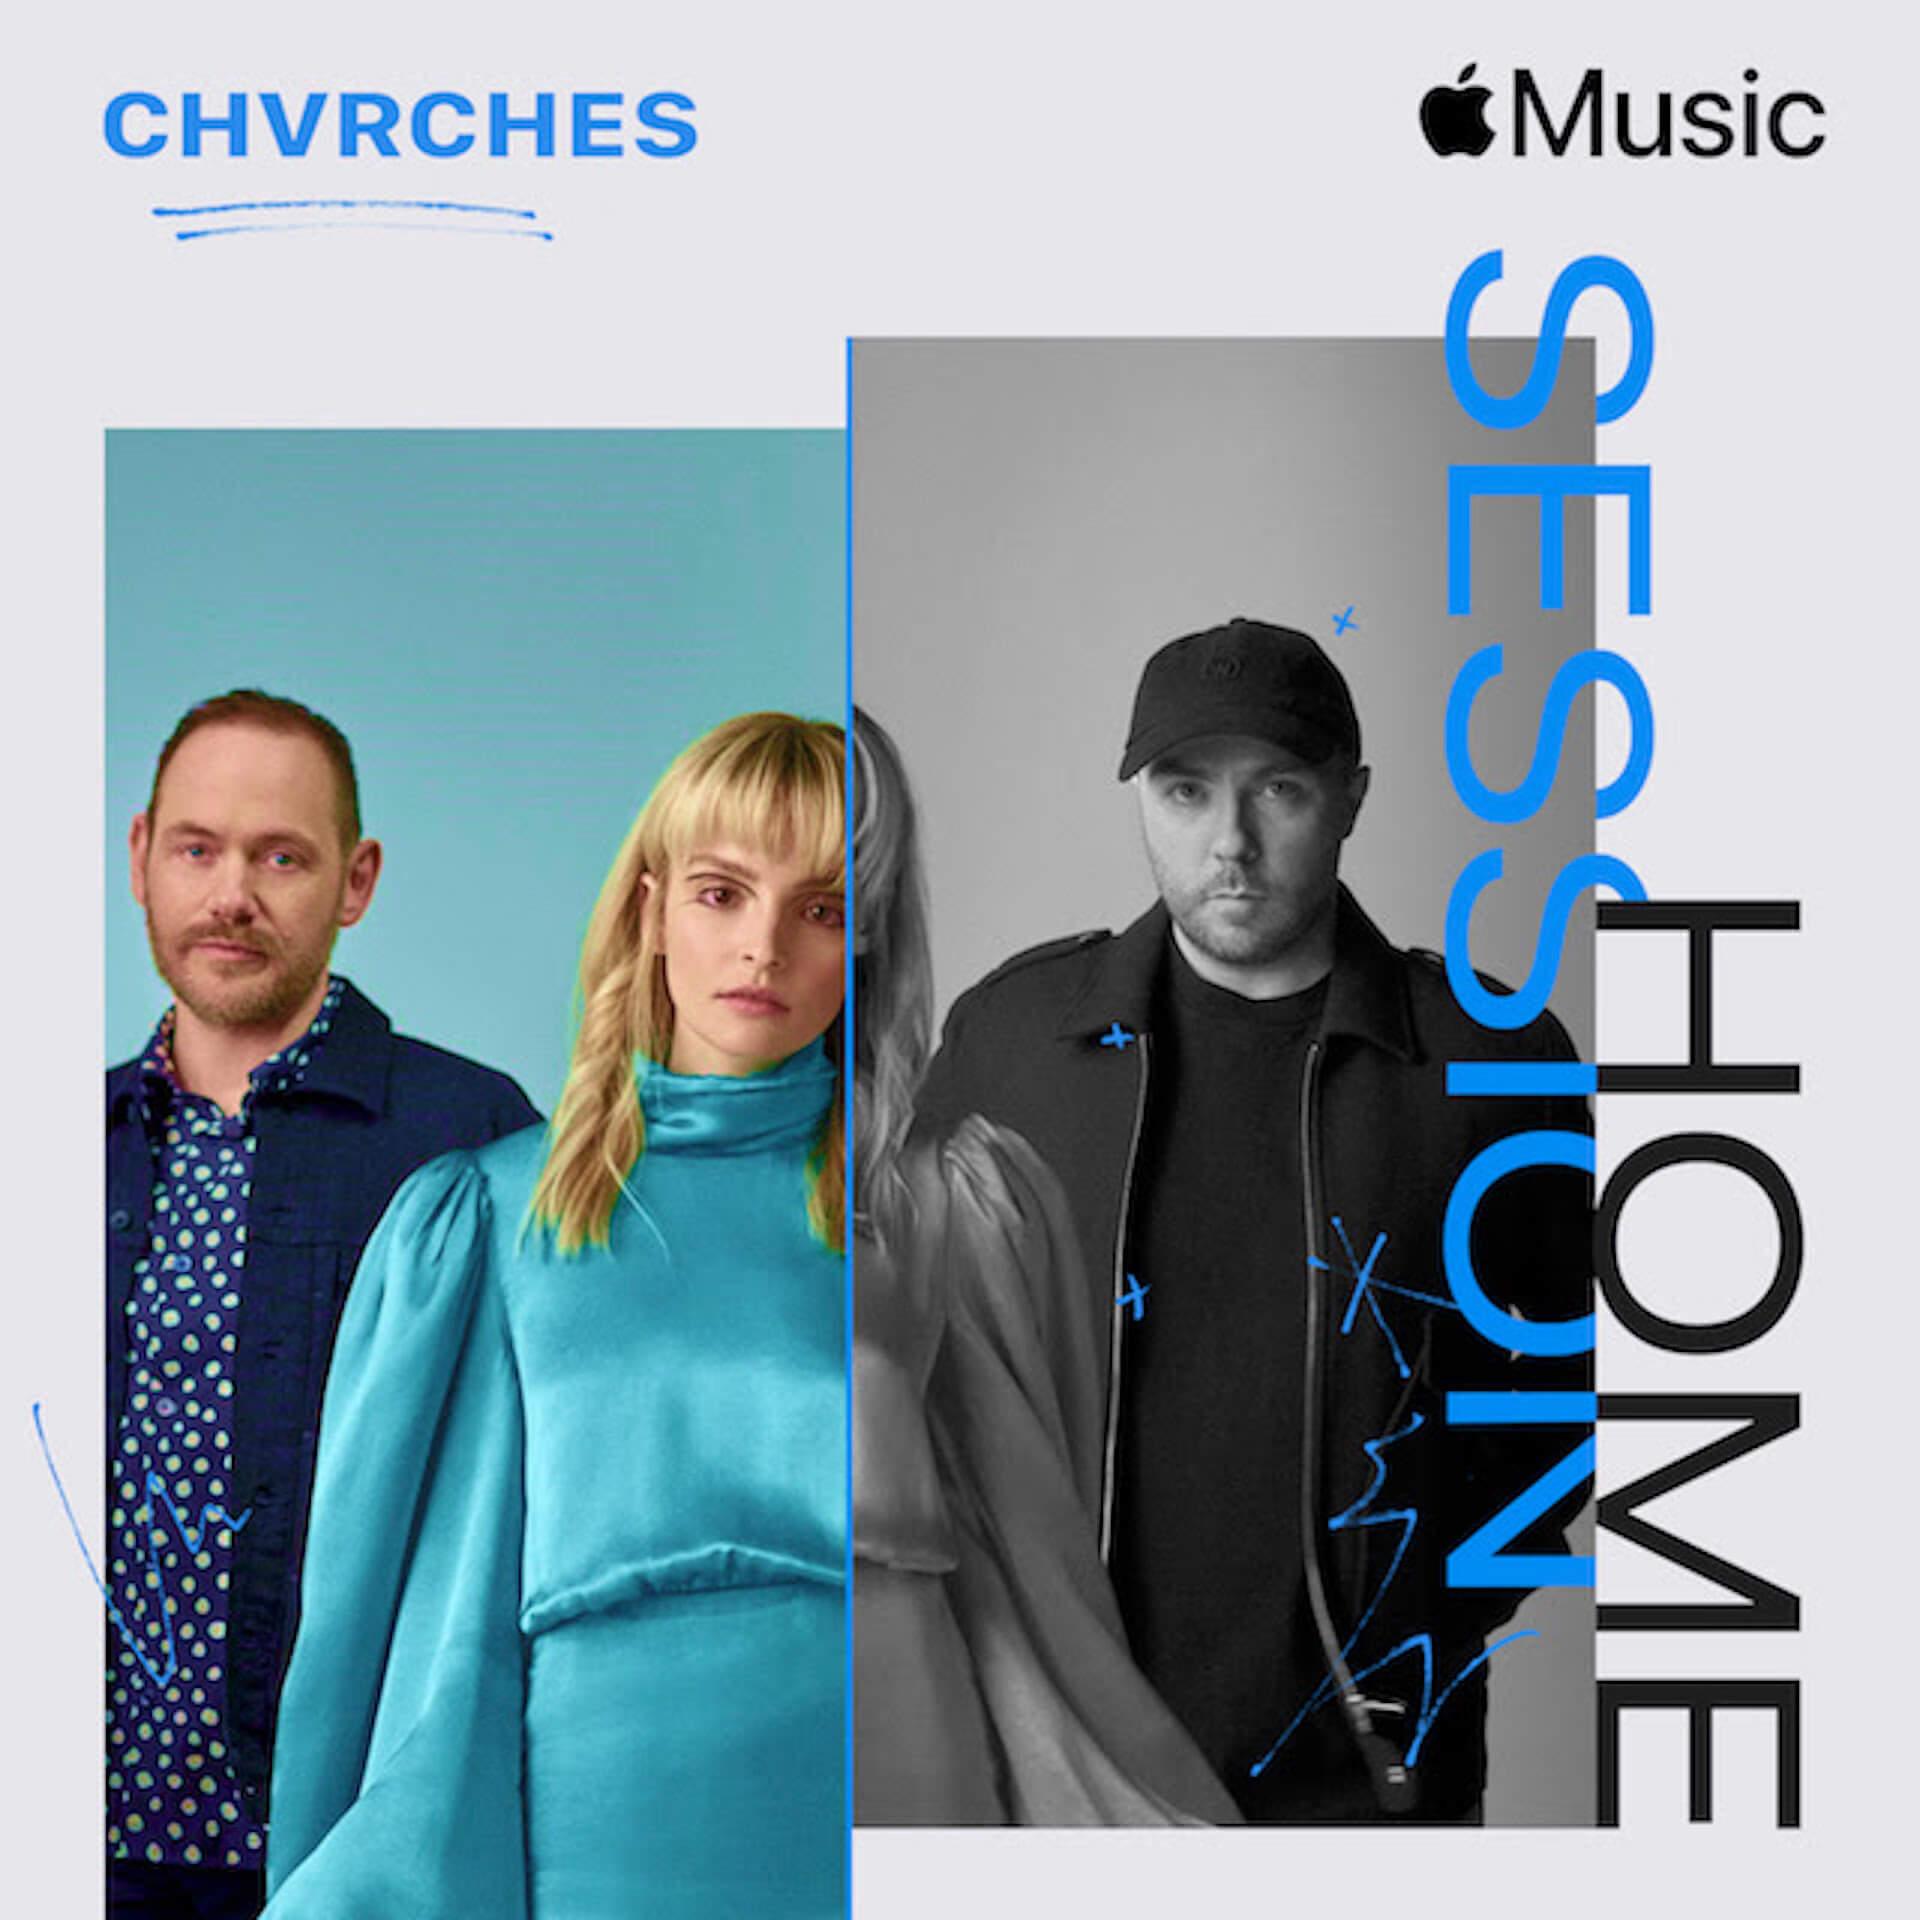 CHVRCHESが生演奏カバー企画『Apple Music Home Session』に初登場!Avril Lavigneのカバー含む2曲が配信開始 music210924_chvrches_03